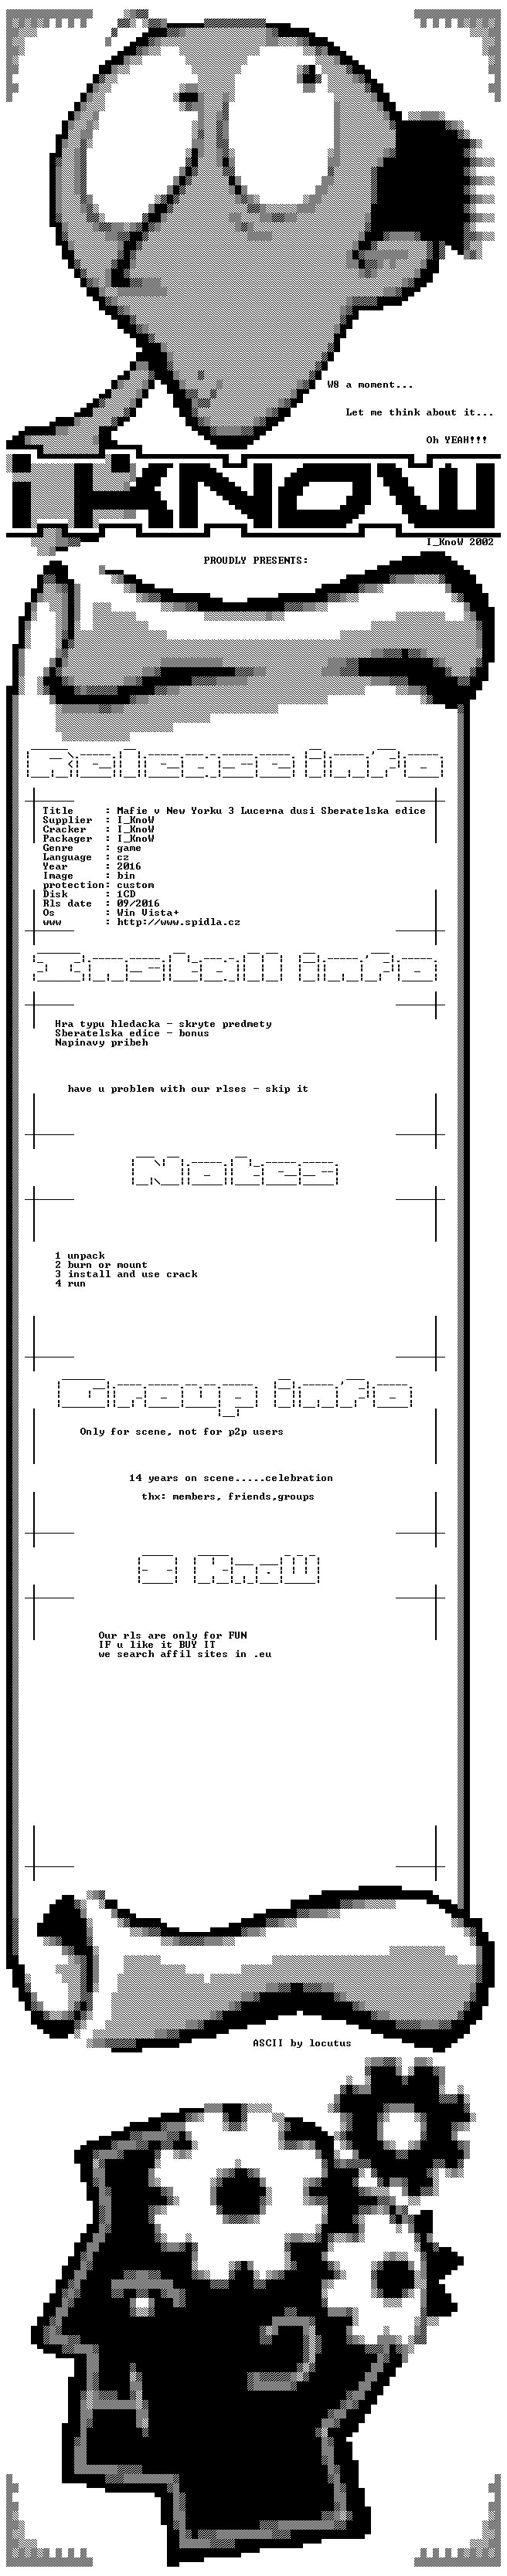 Mafie v New Yorku 3 Lucerna dusi Sberetelska edice CZ-I KnoW